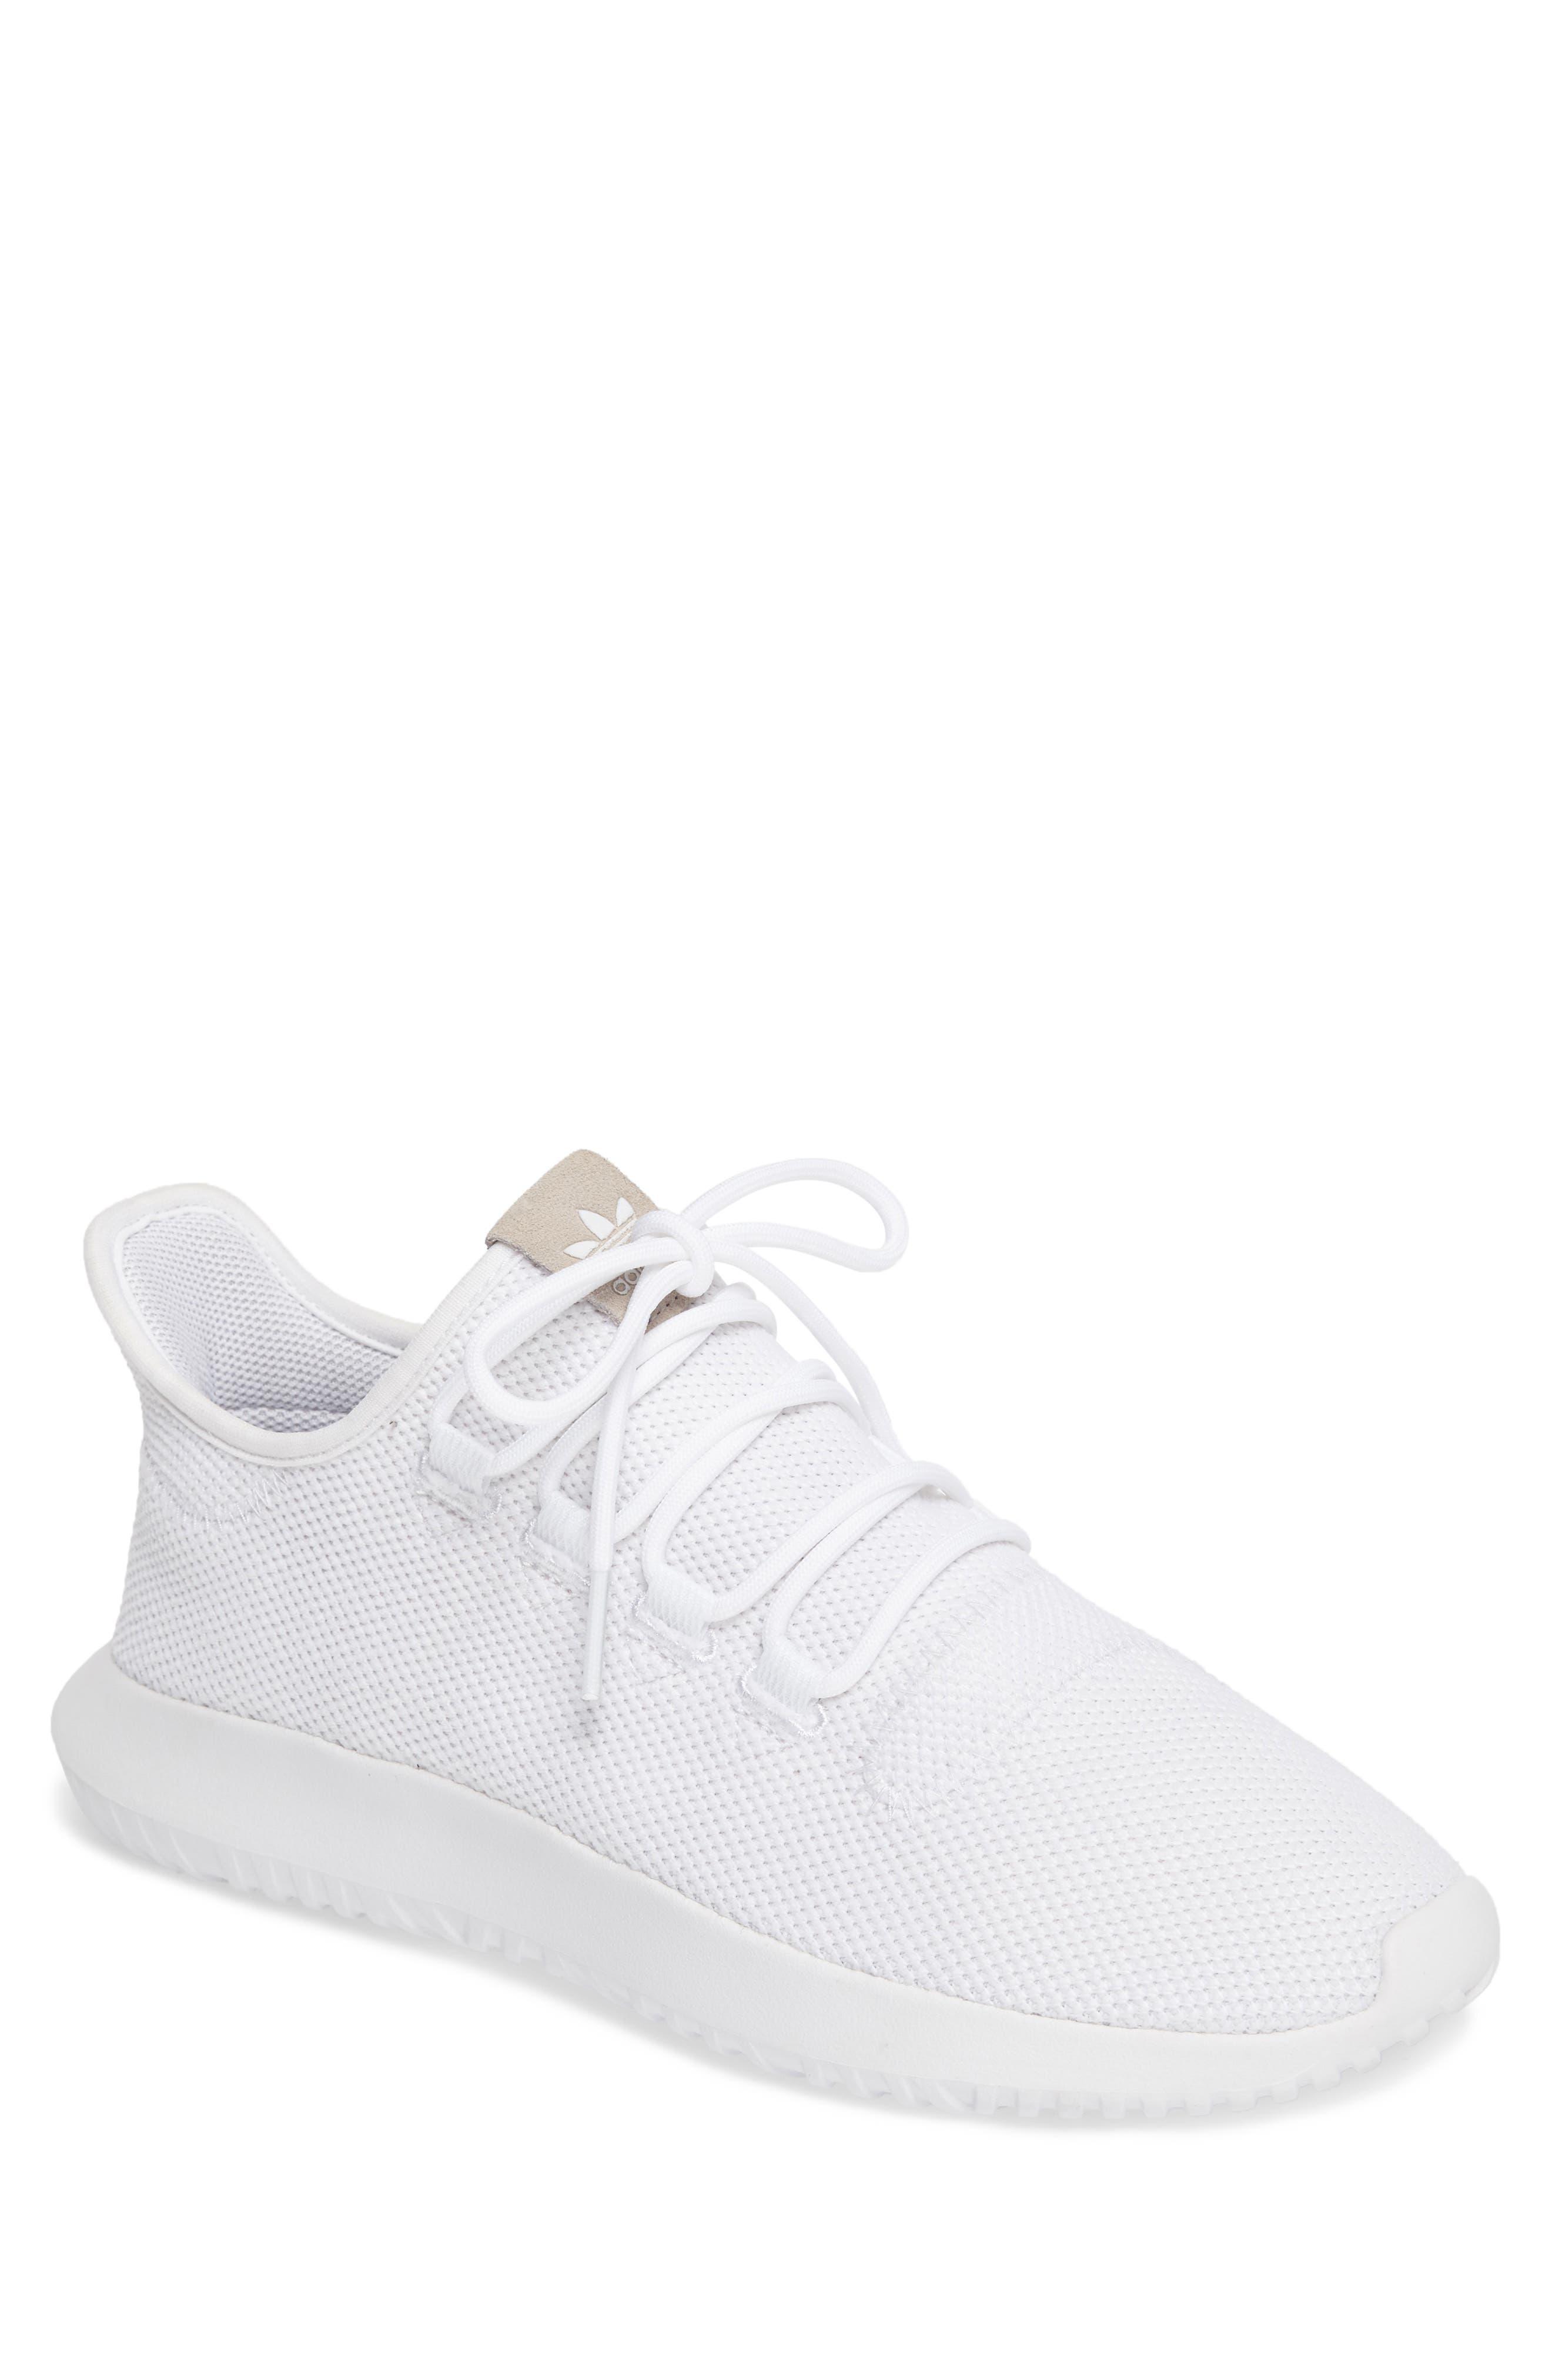 Main Image - adidas Tubular Shadow Sneaker (Men)